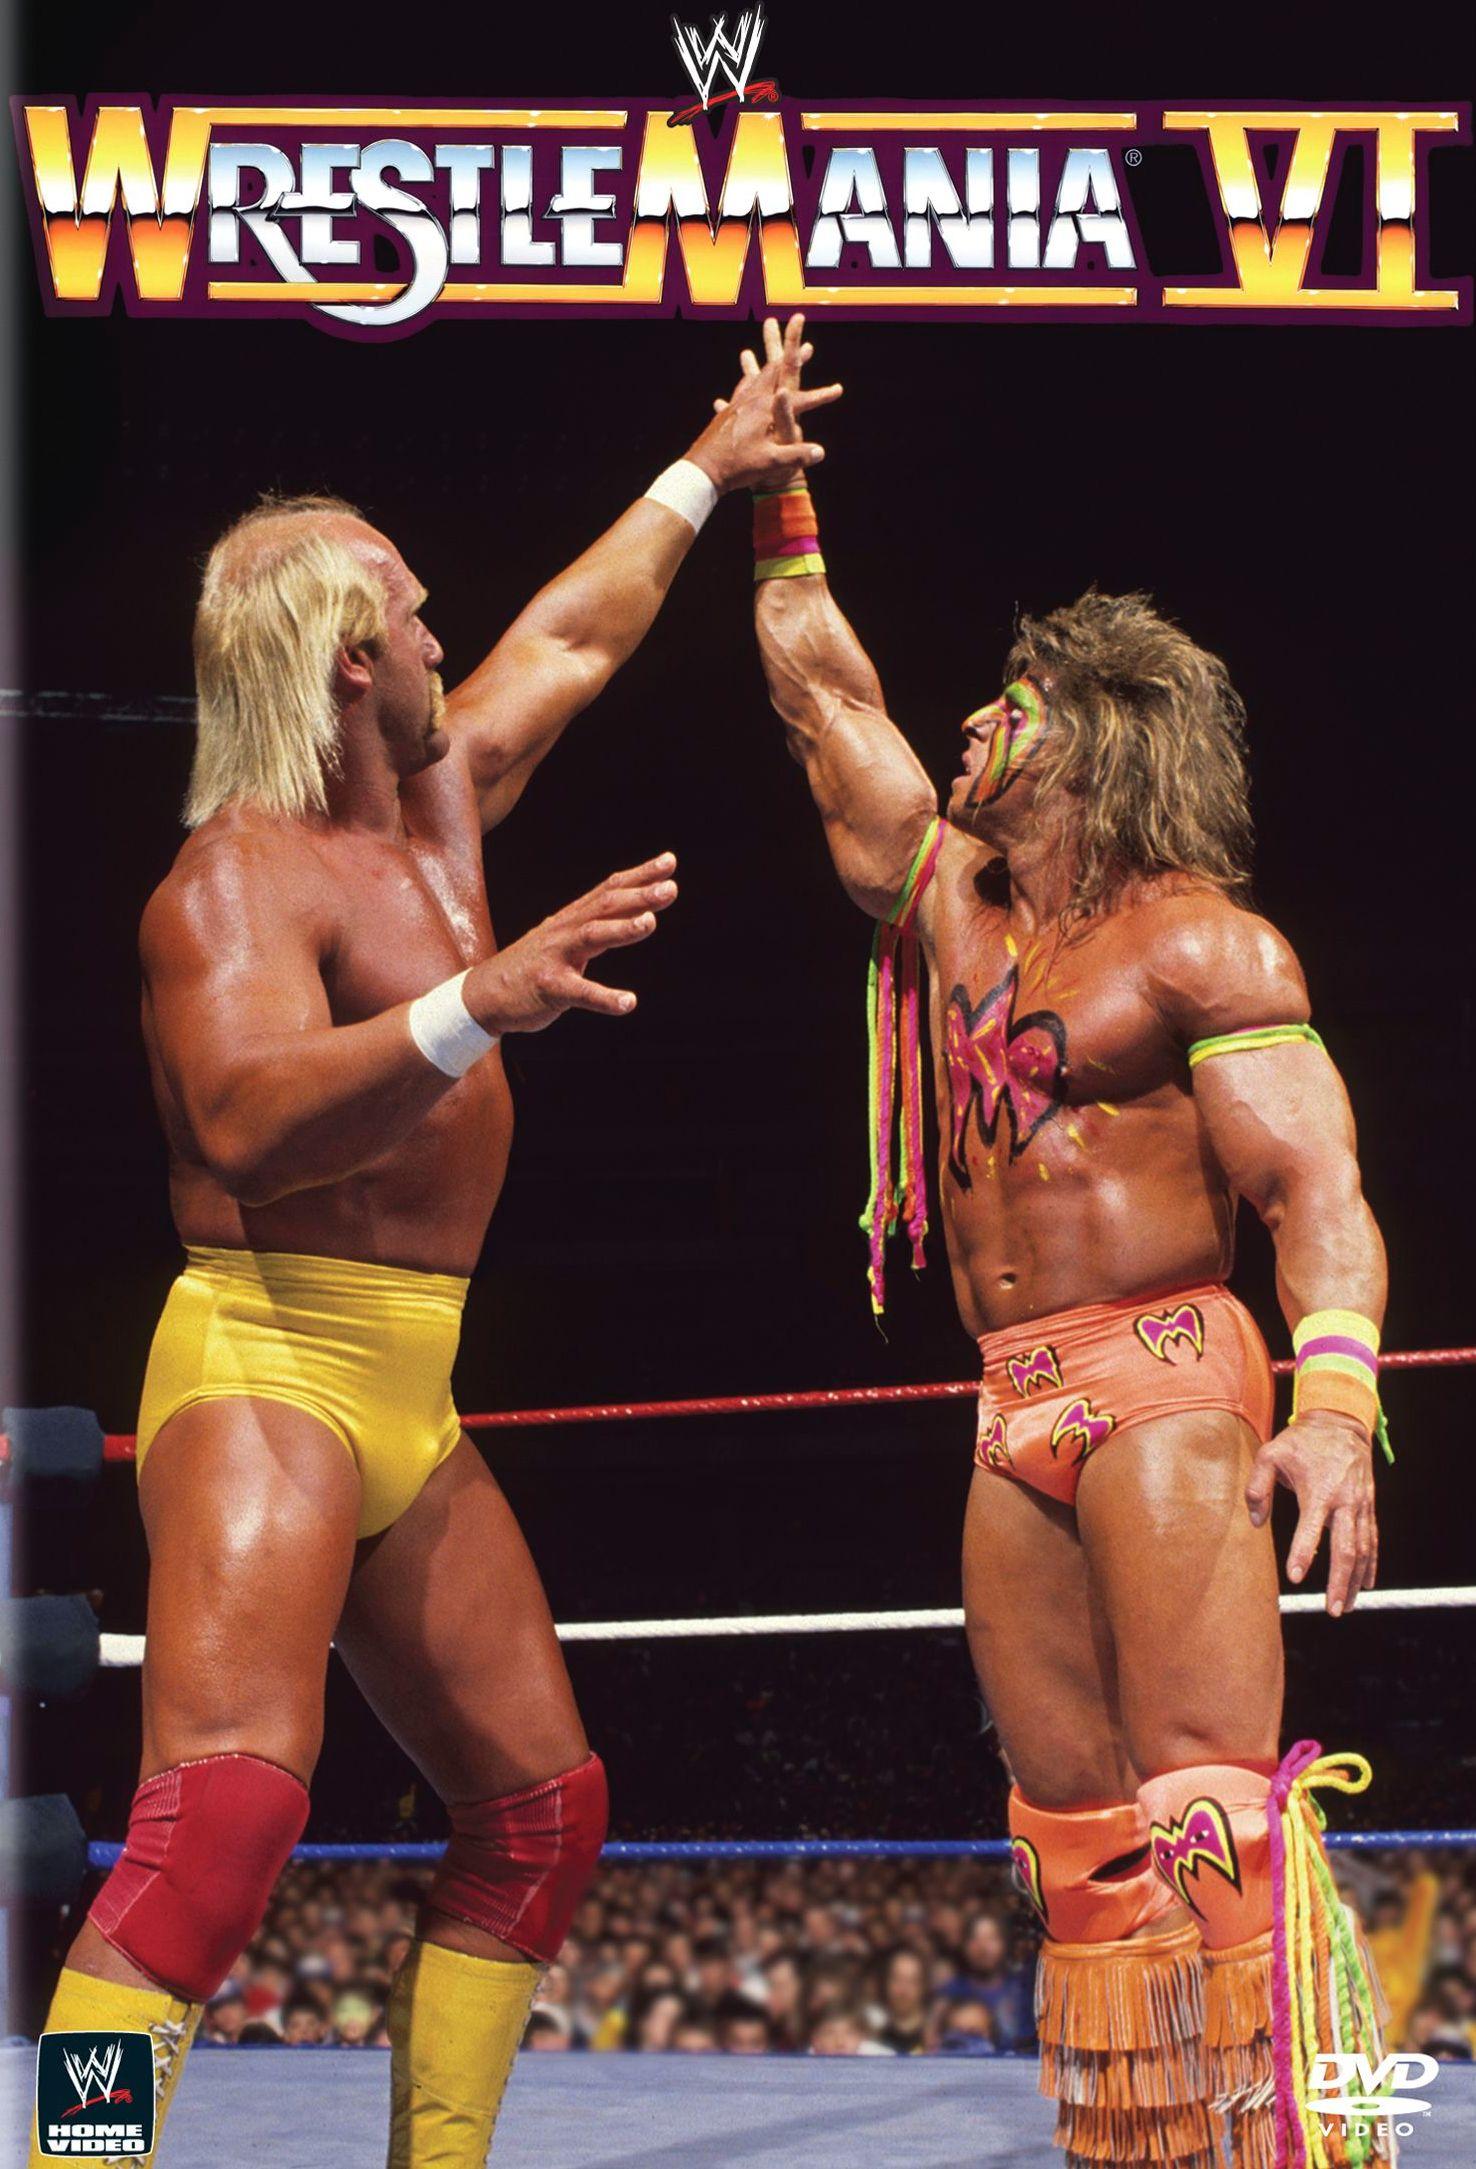 WWE: Wrestlemania VI